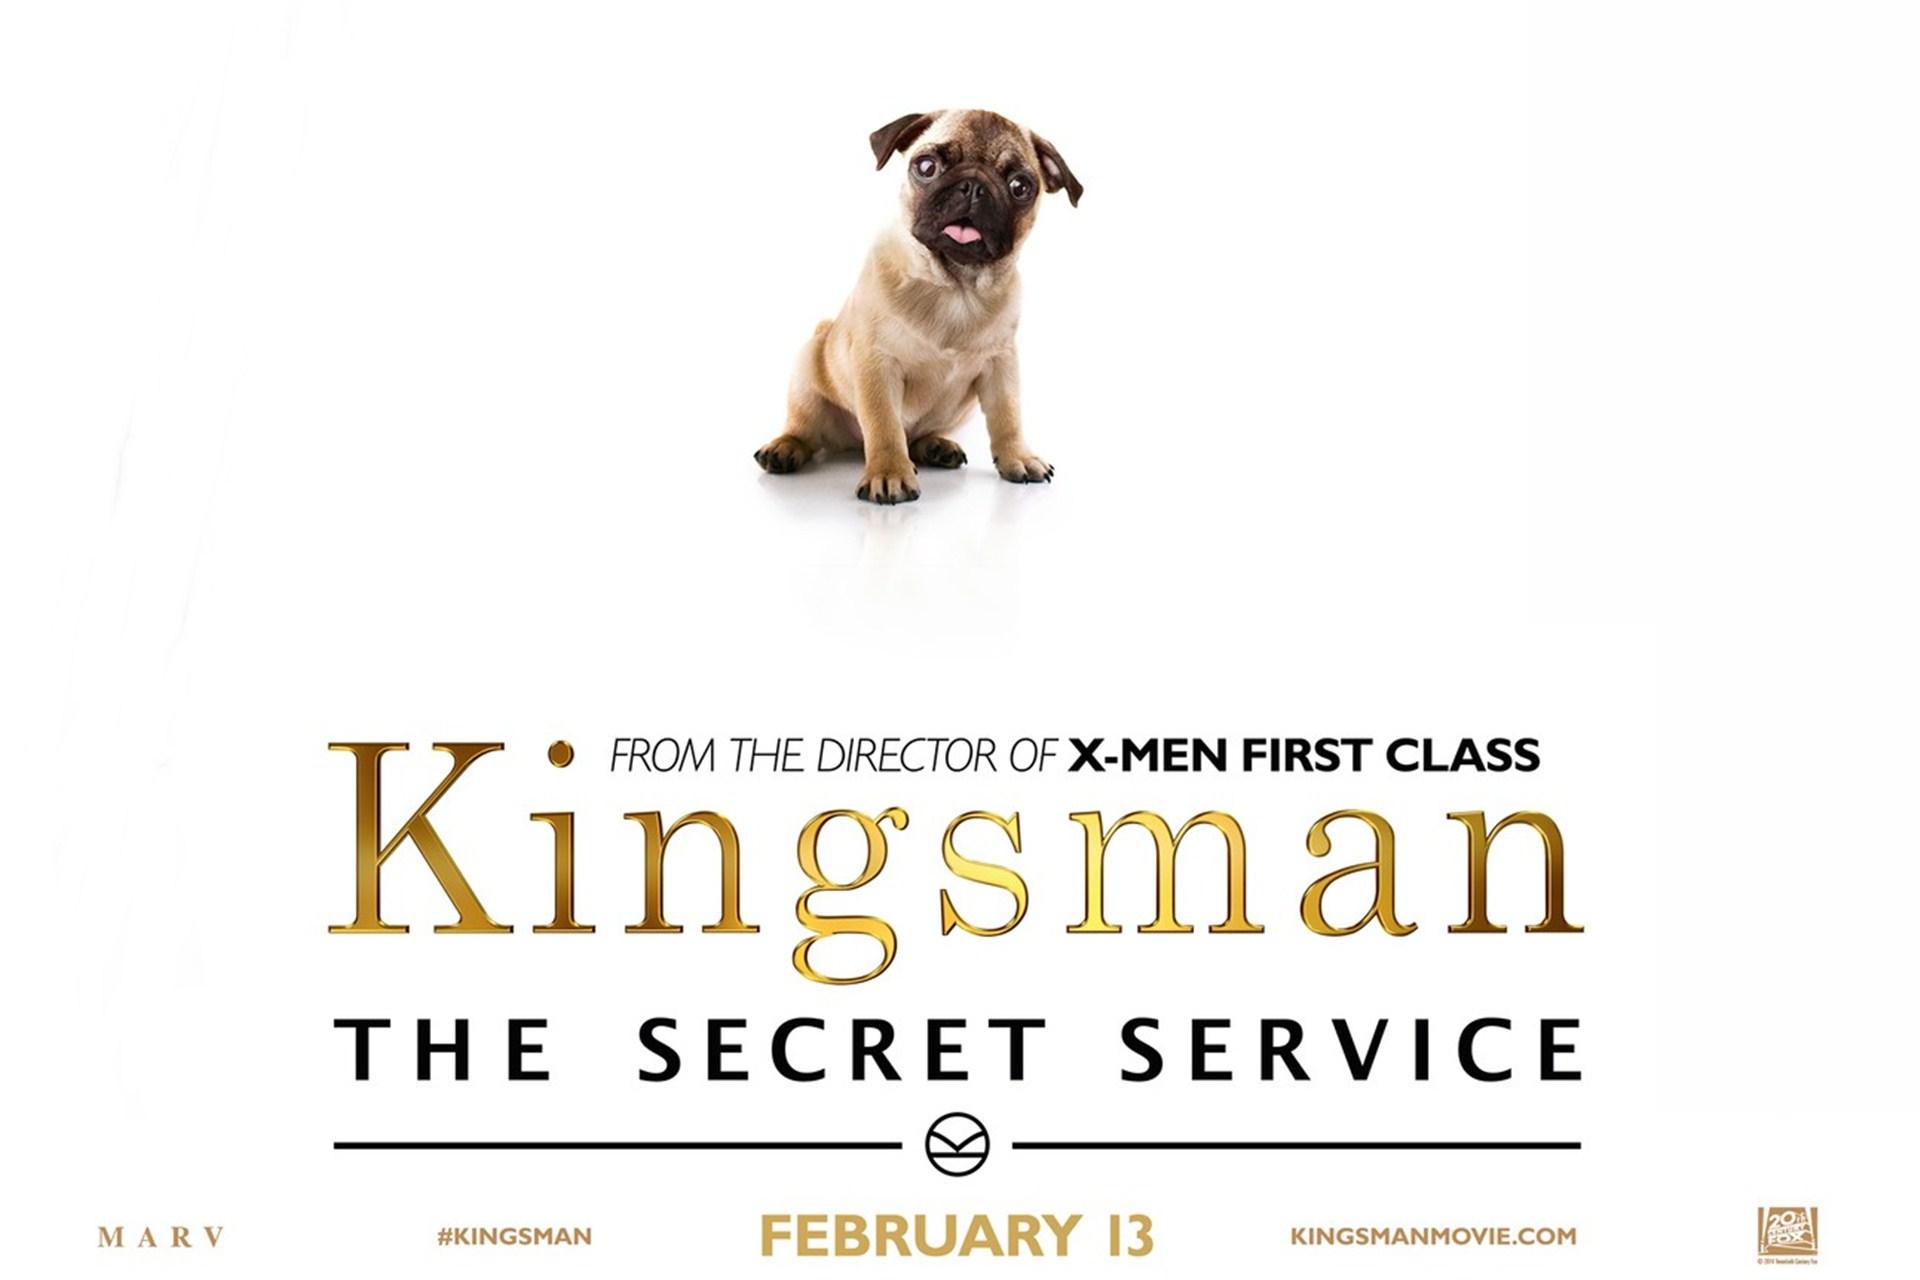 kingsman-the-secret-service-dog-wallpapers_1.jpg